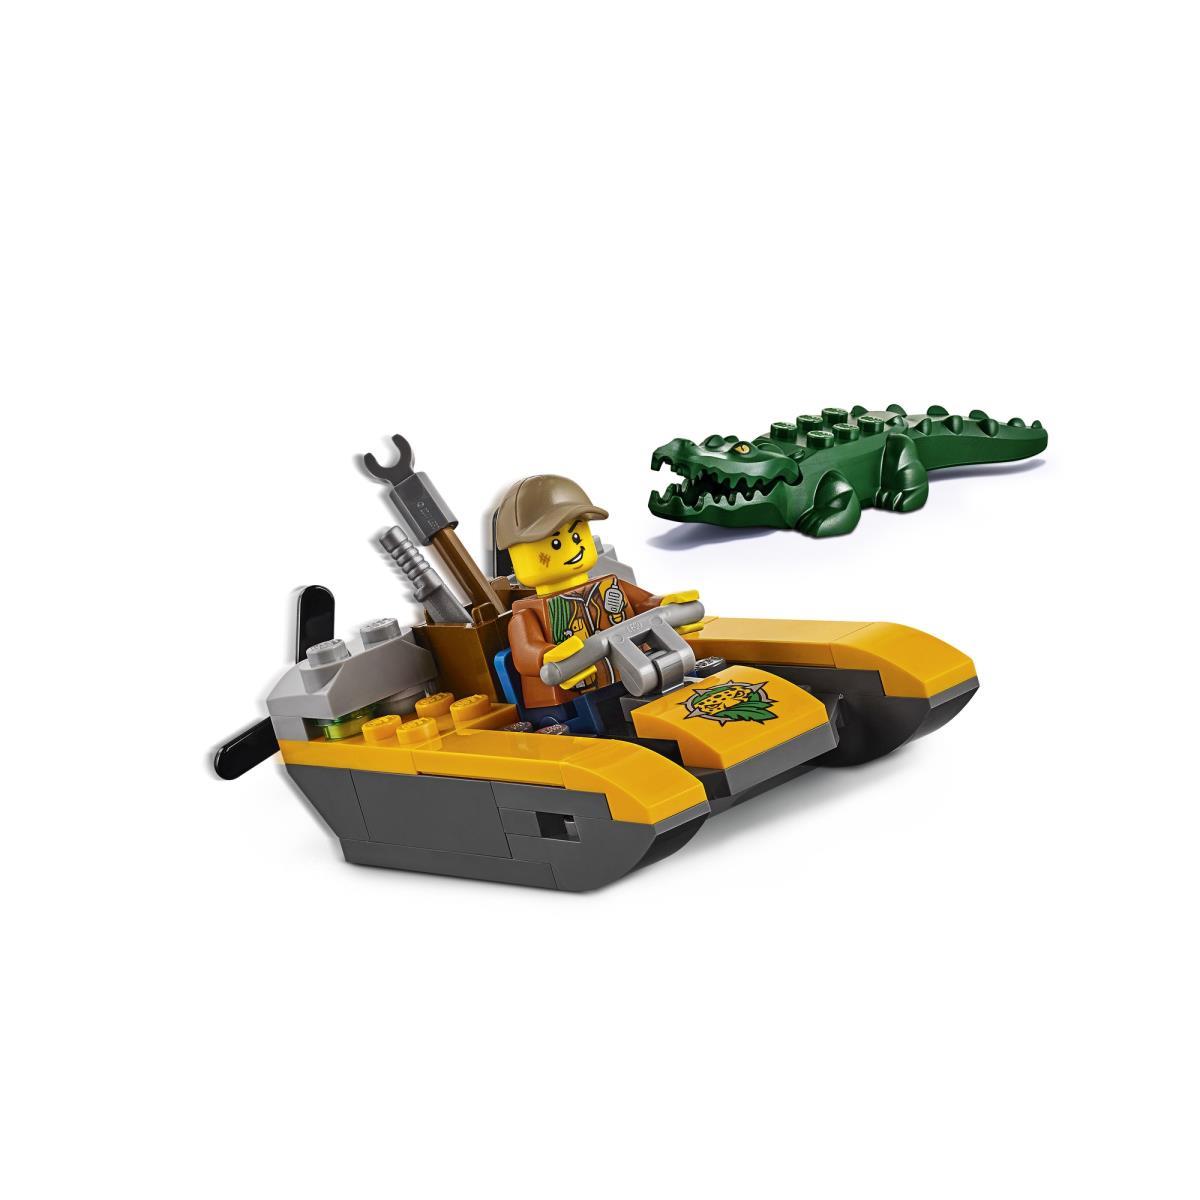 LEGO City 60157  Dschungel Starter Set,Lego,000051331784, 5702015866033